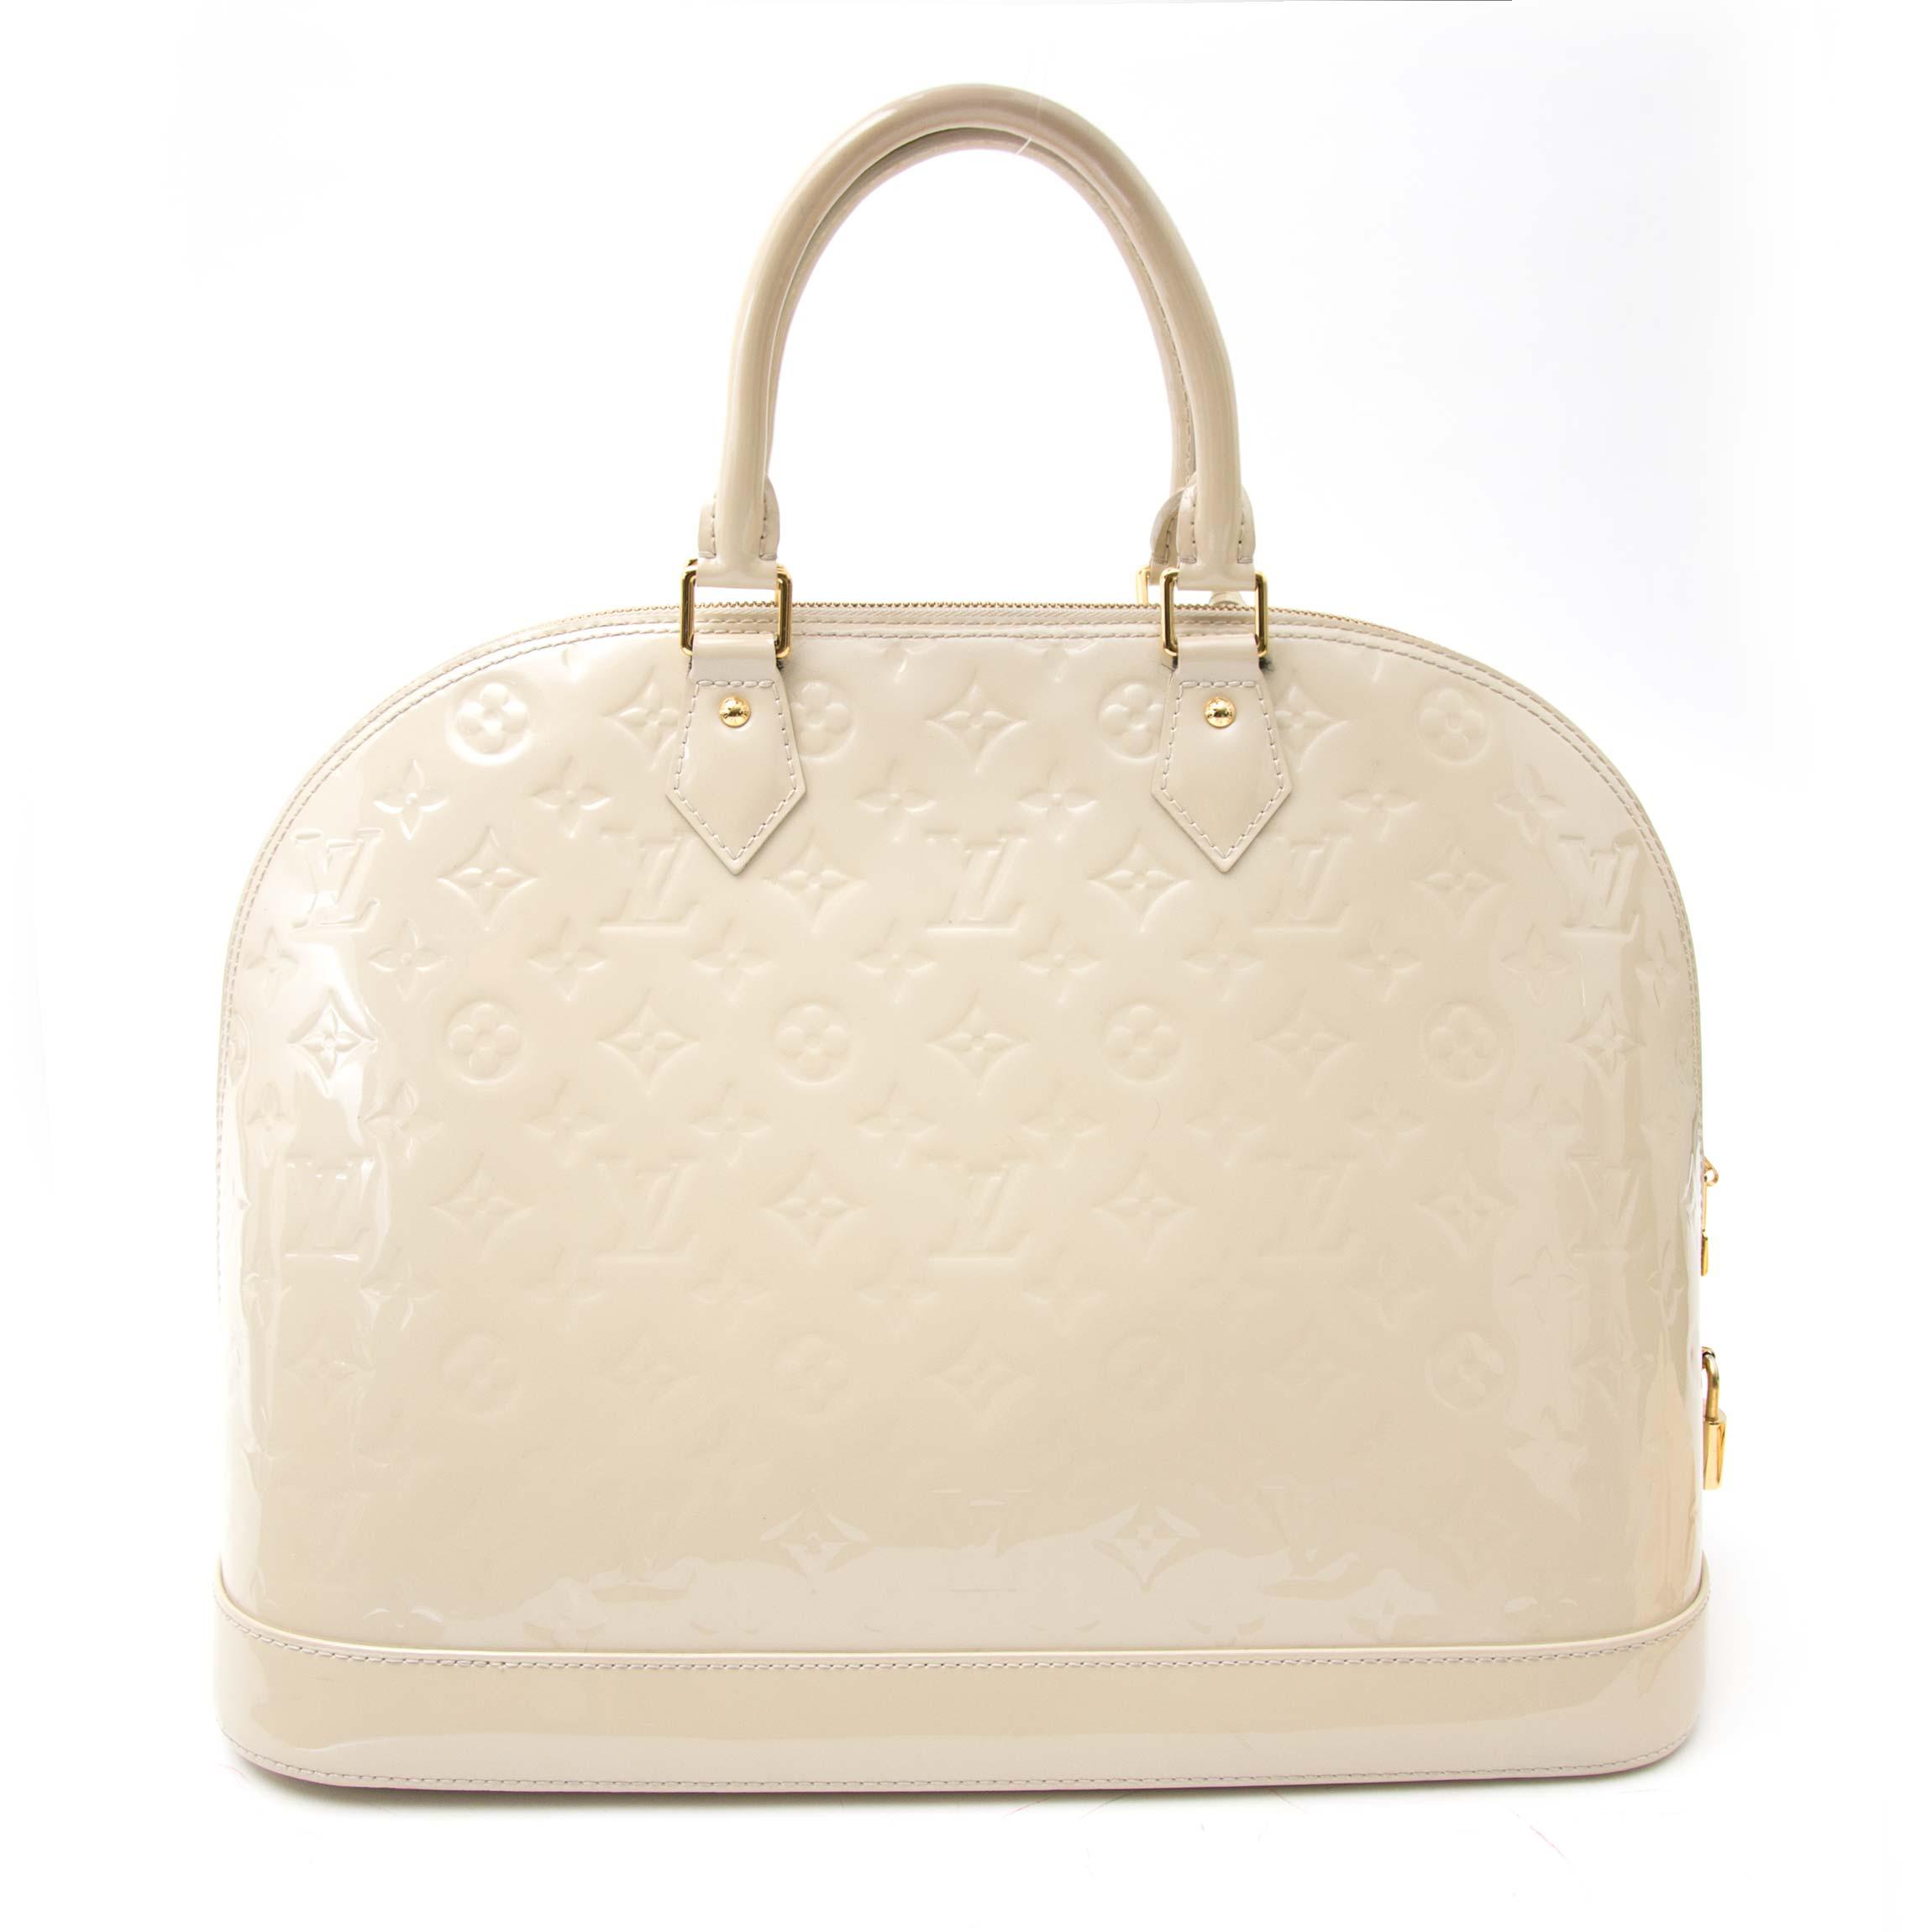 Shop the Louis Vuitton Alma Vernis right now www.labellov.com, the practical everyday bag, Labellov ships worldwide.